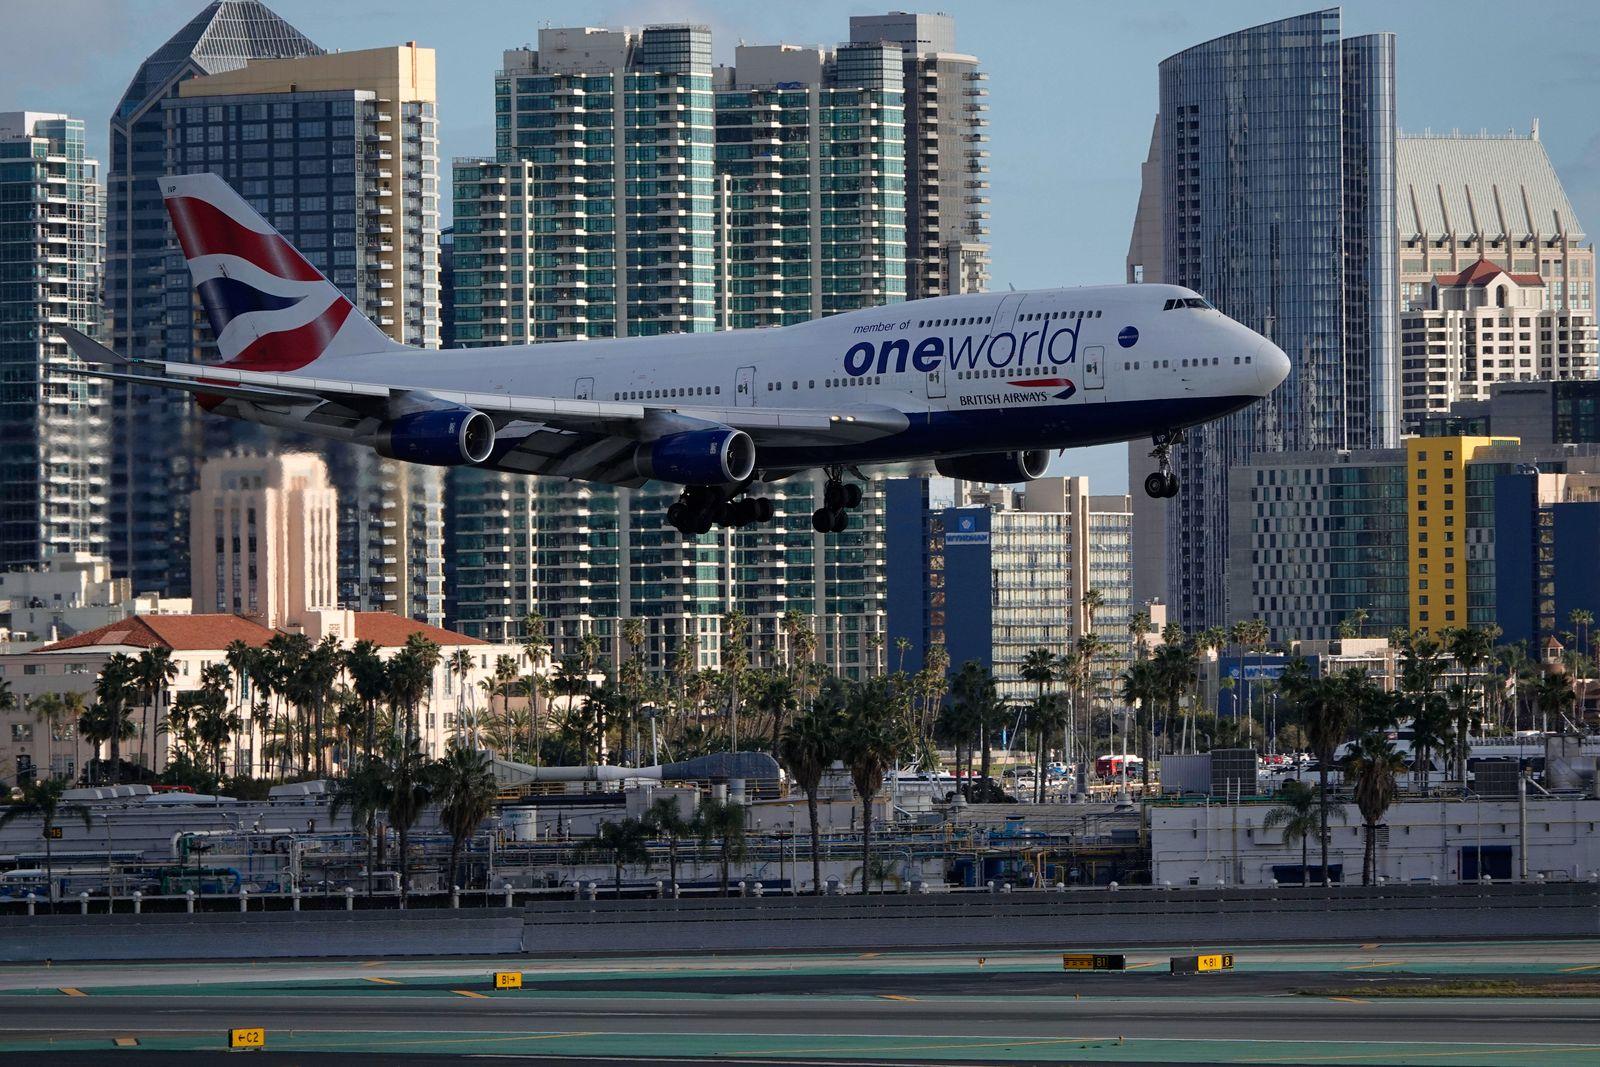 March 15, 2020, San Diego, California, USA: A British Airways Boeing 747 arrives for a landing at San Diego Internationa